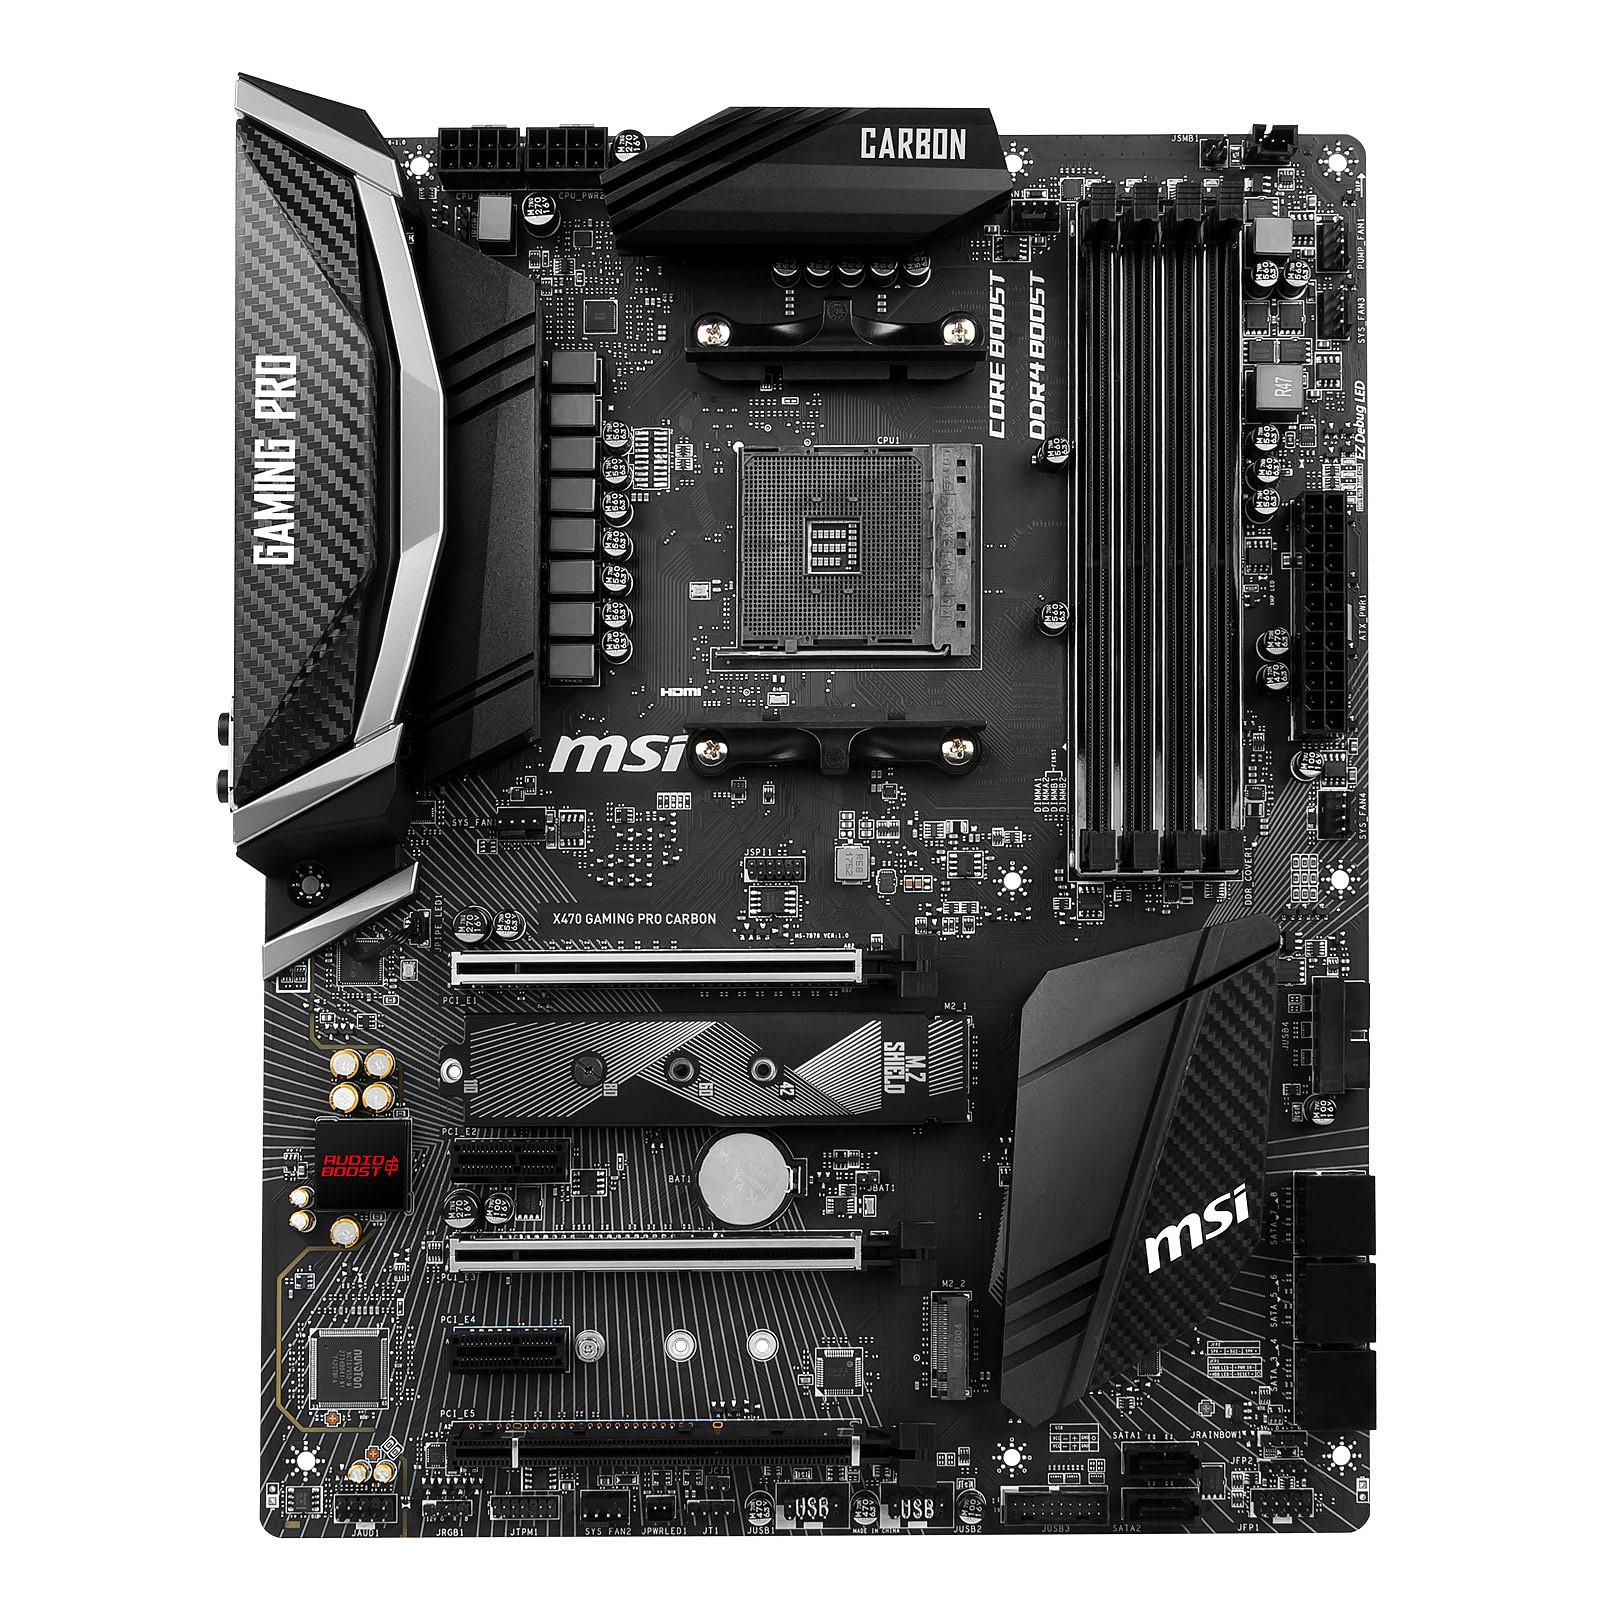 Kit de actualización PC AMD Ryzen 5 2600X MSI X470 GAMING PRO CARBONO